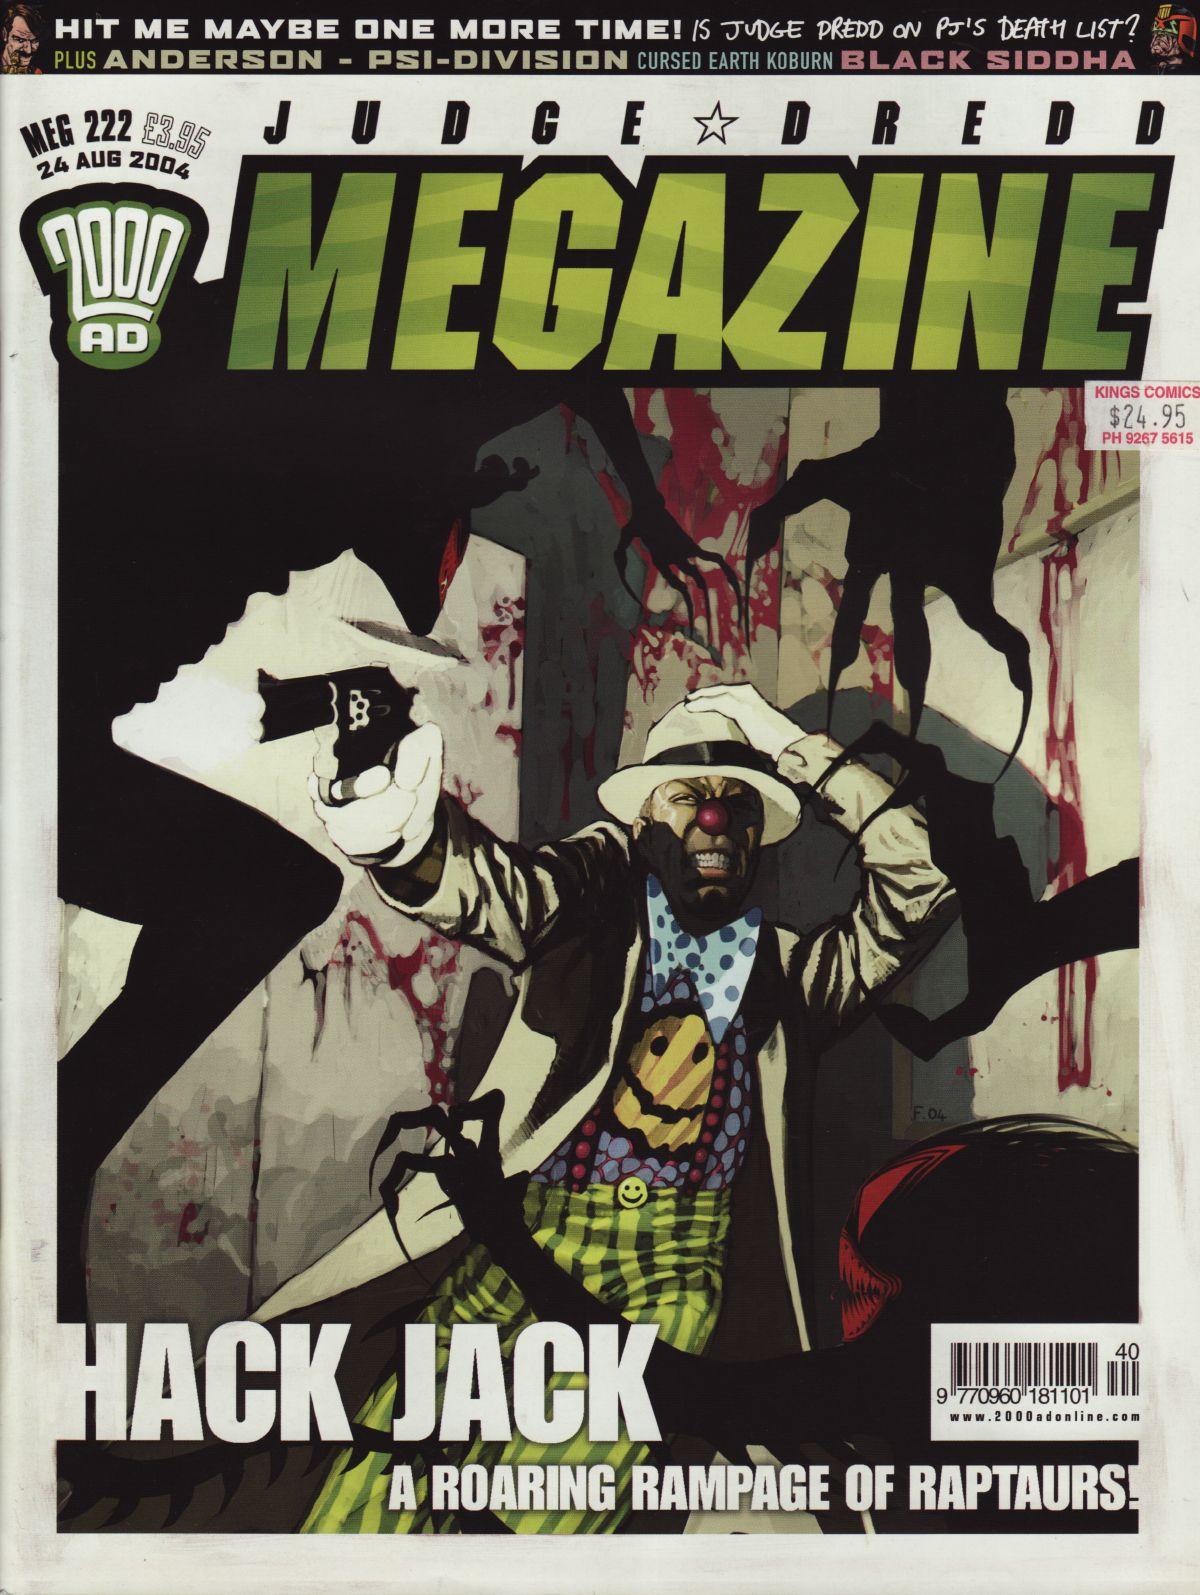 Judge Dredd Megazine (Vol. 5) issue 222 - Page 1